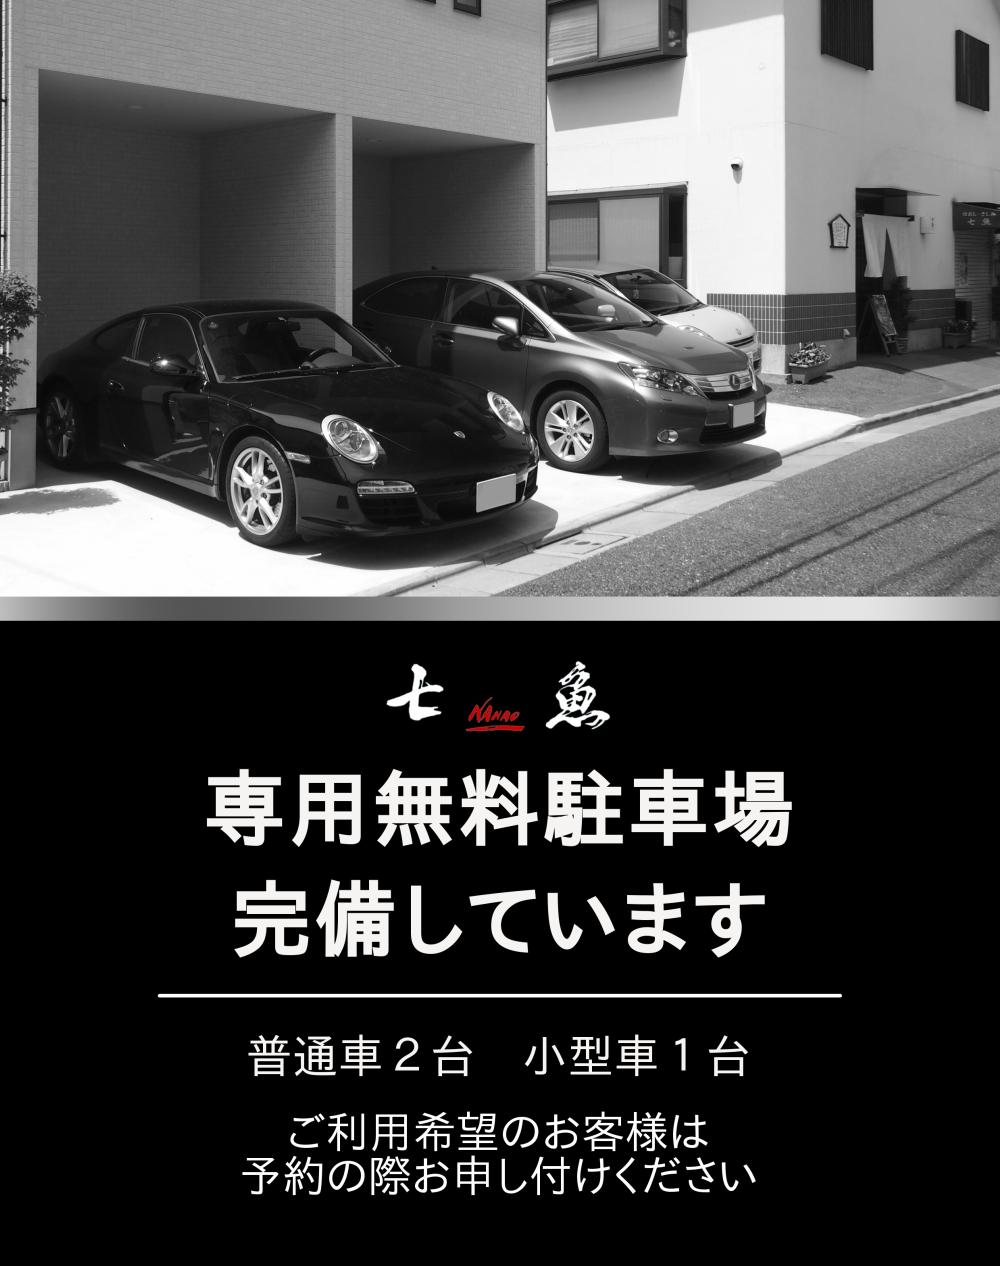 七魚で法事の食事会【駐車場完備】